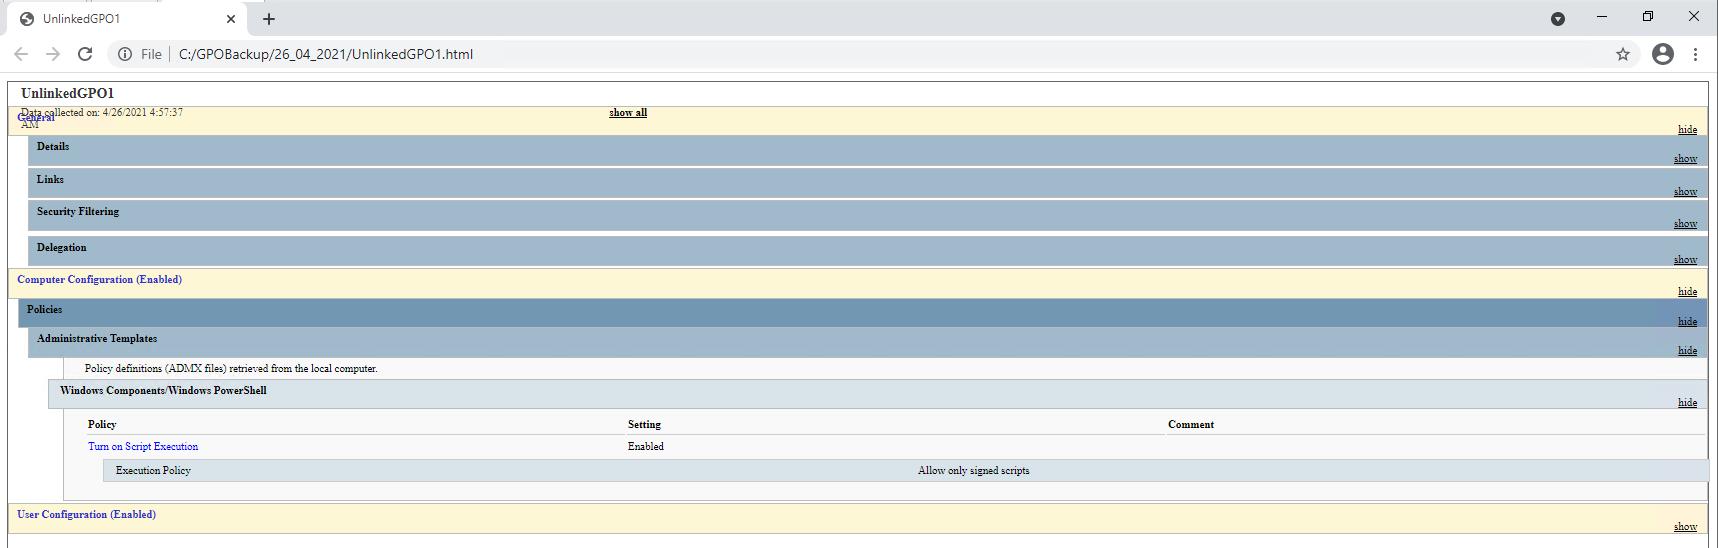 GPO HTML report